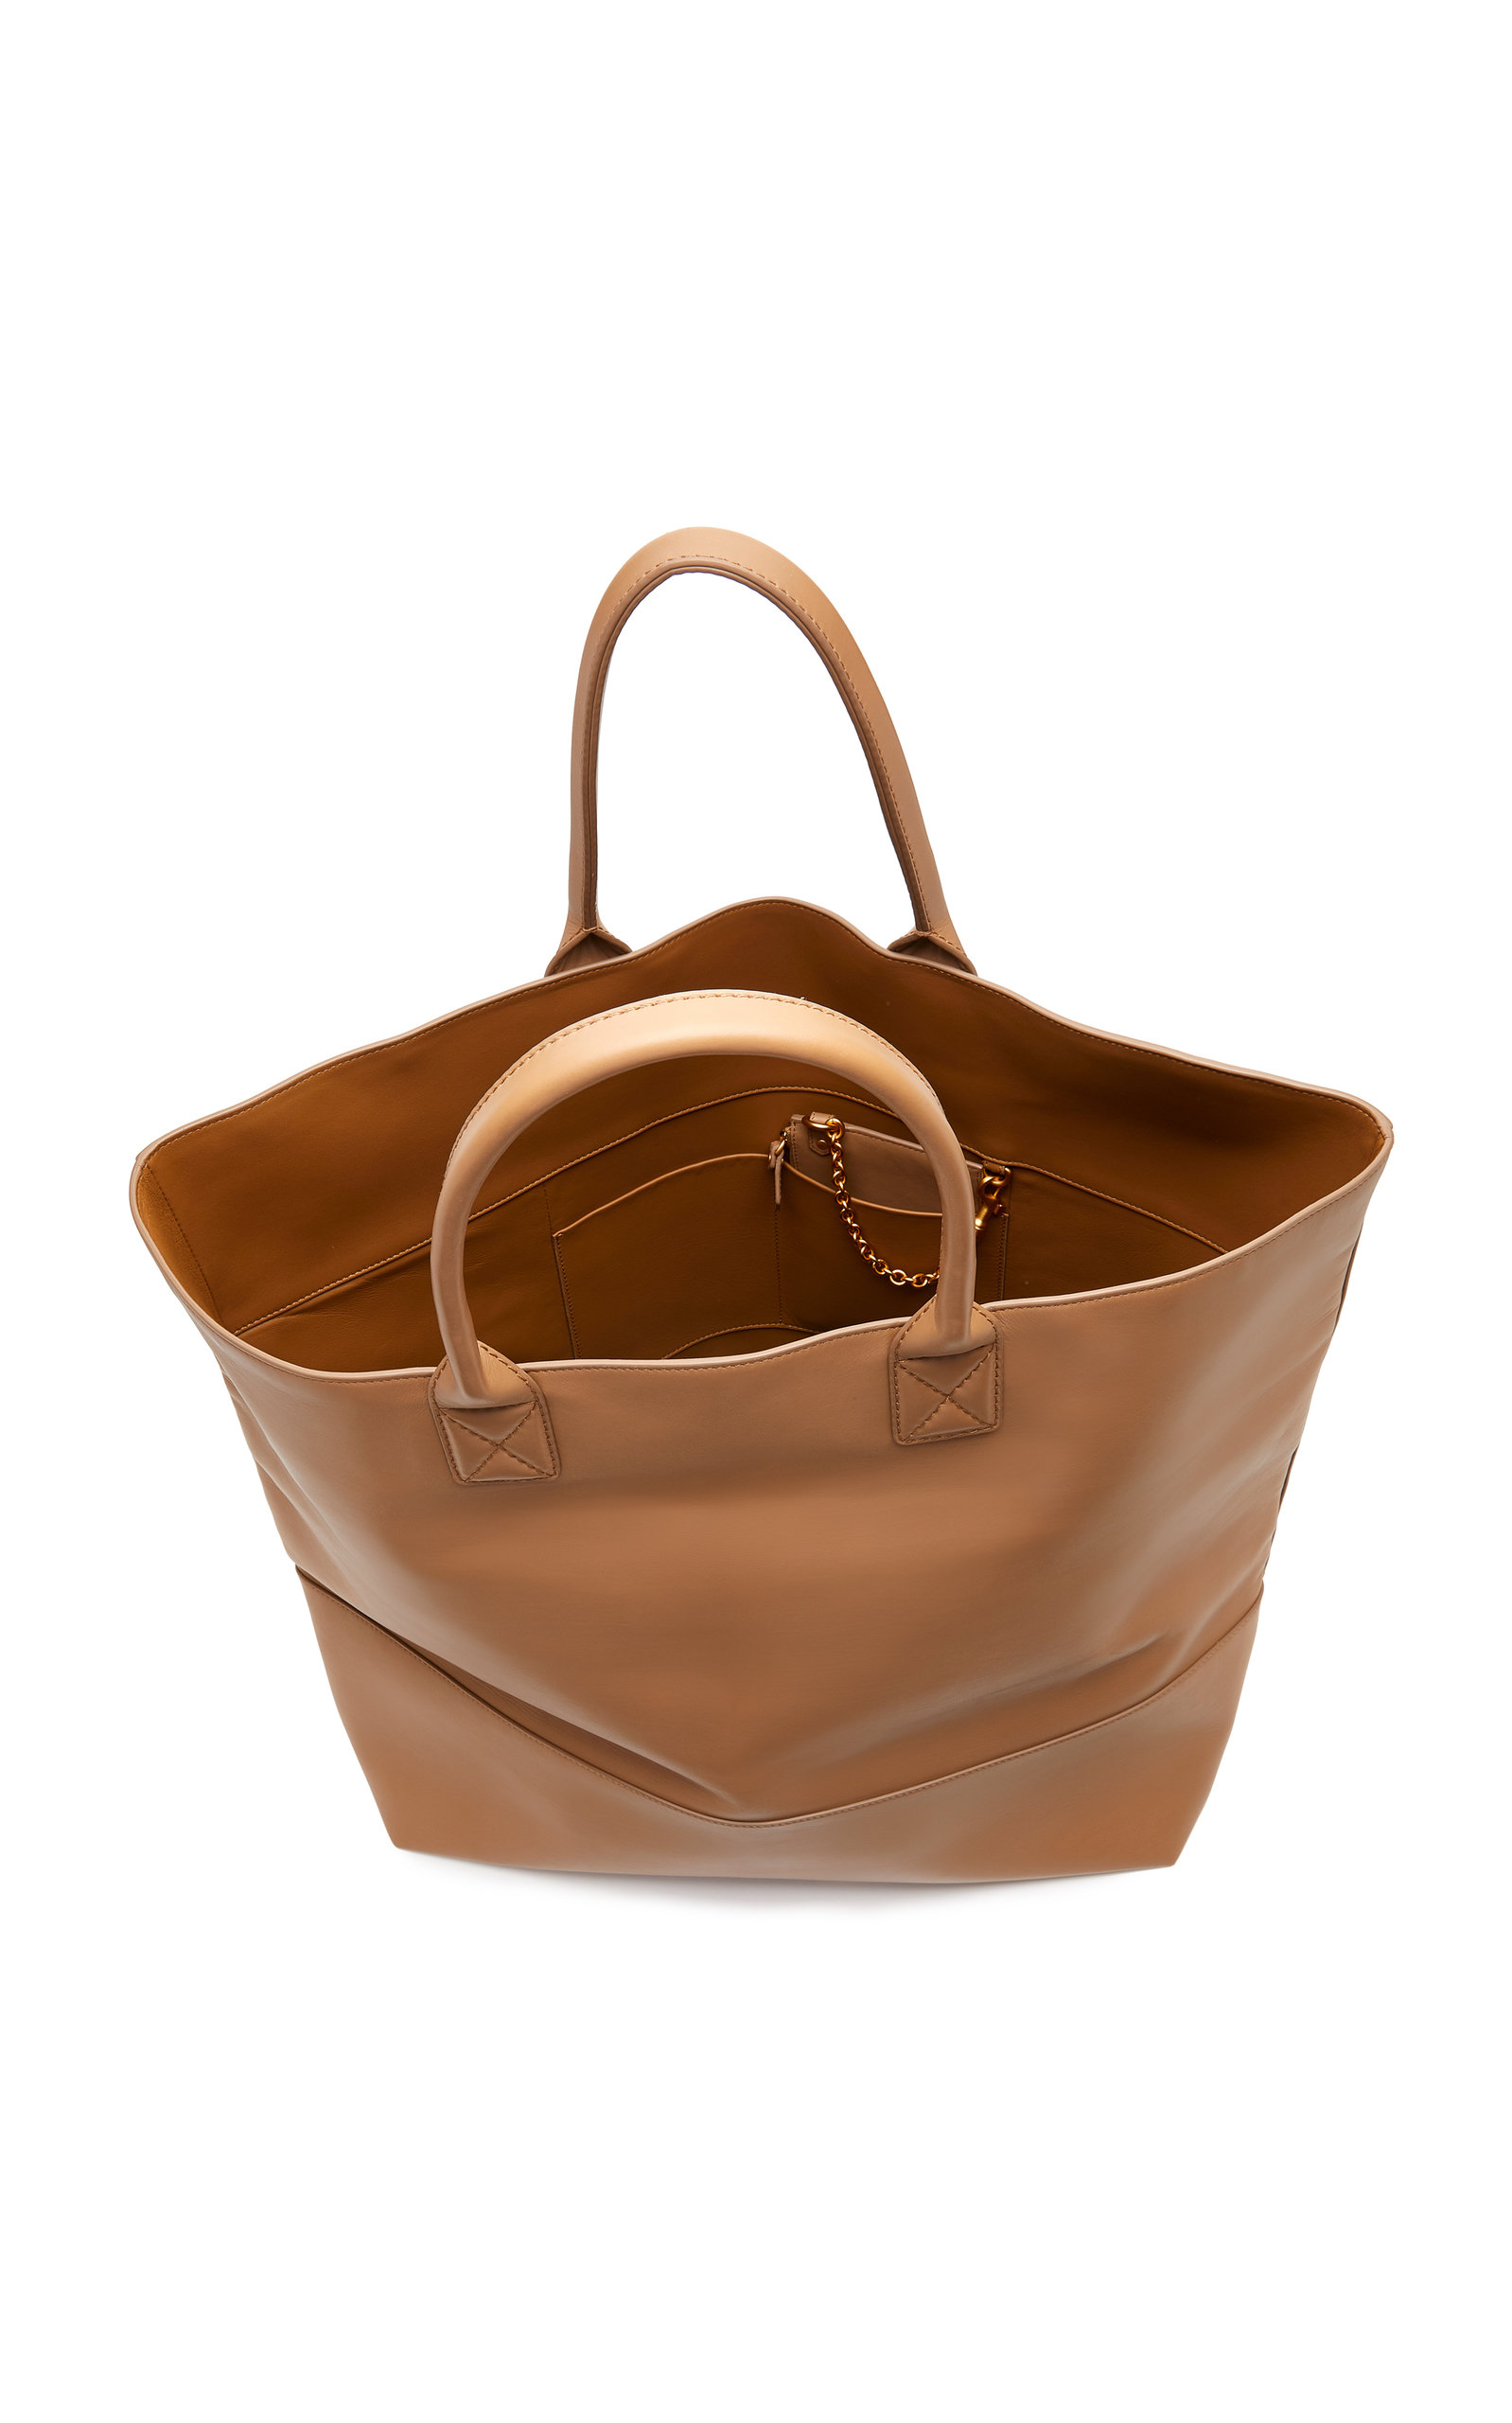 8c00d23136d9e Cabat Oversized Leather Tote by Bottega Veneta | Moda Operandi